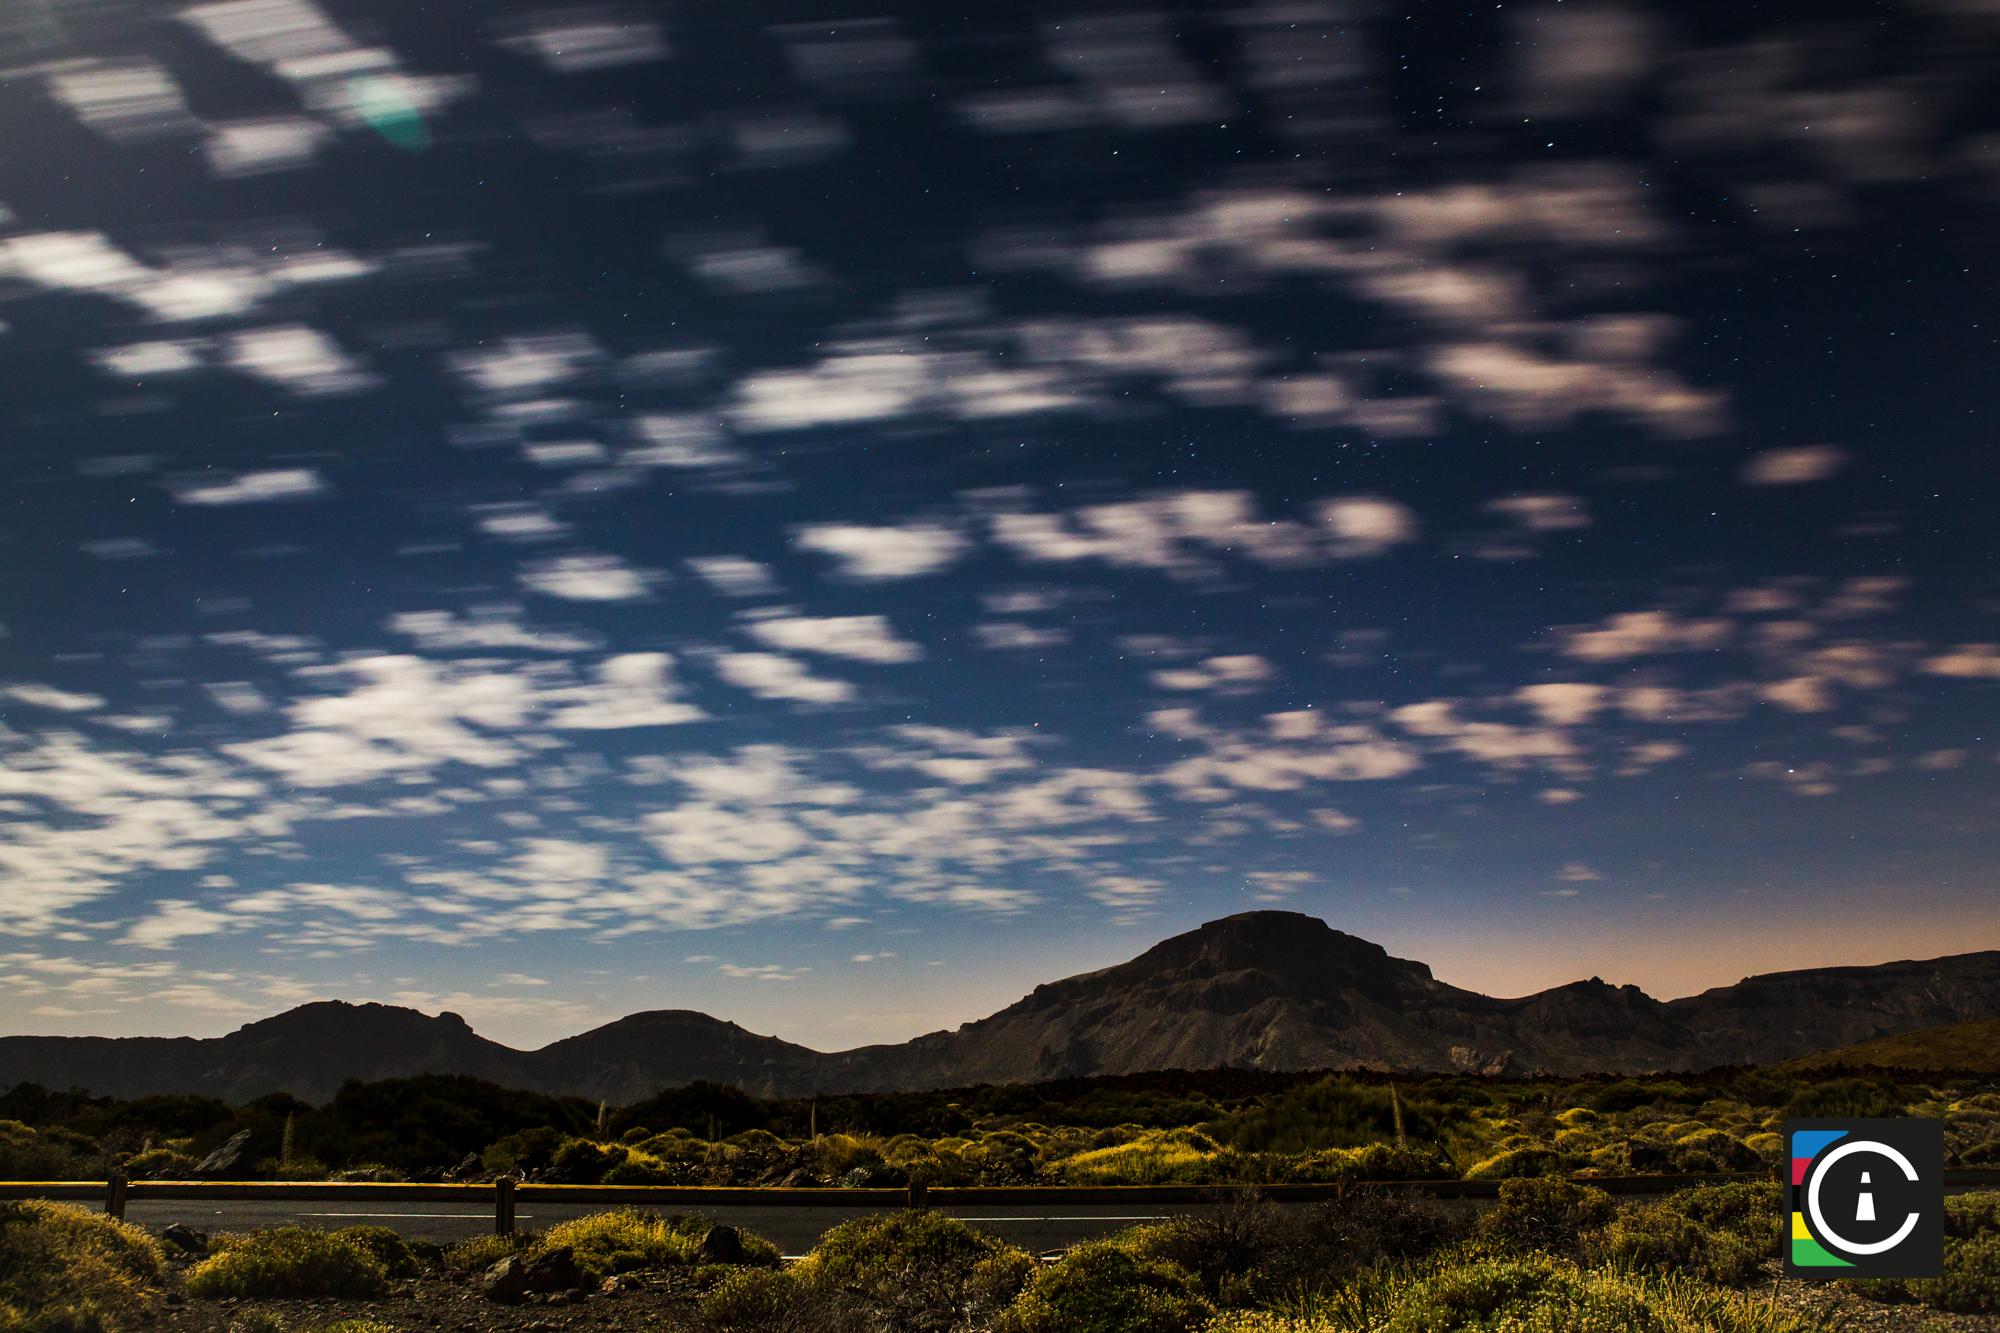 Teneryfa, Teide